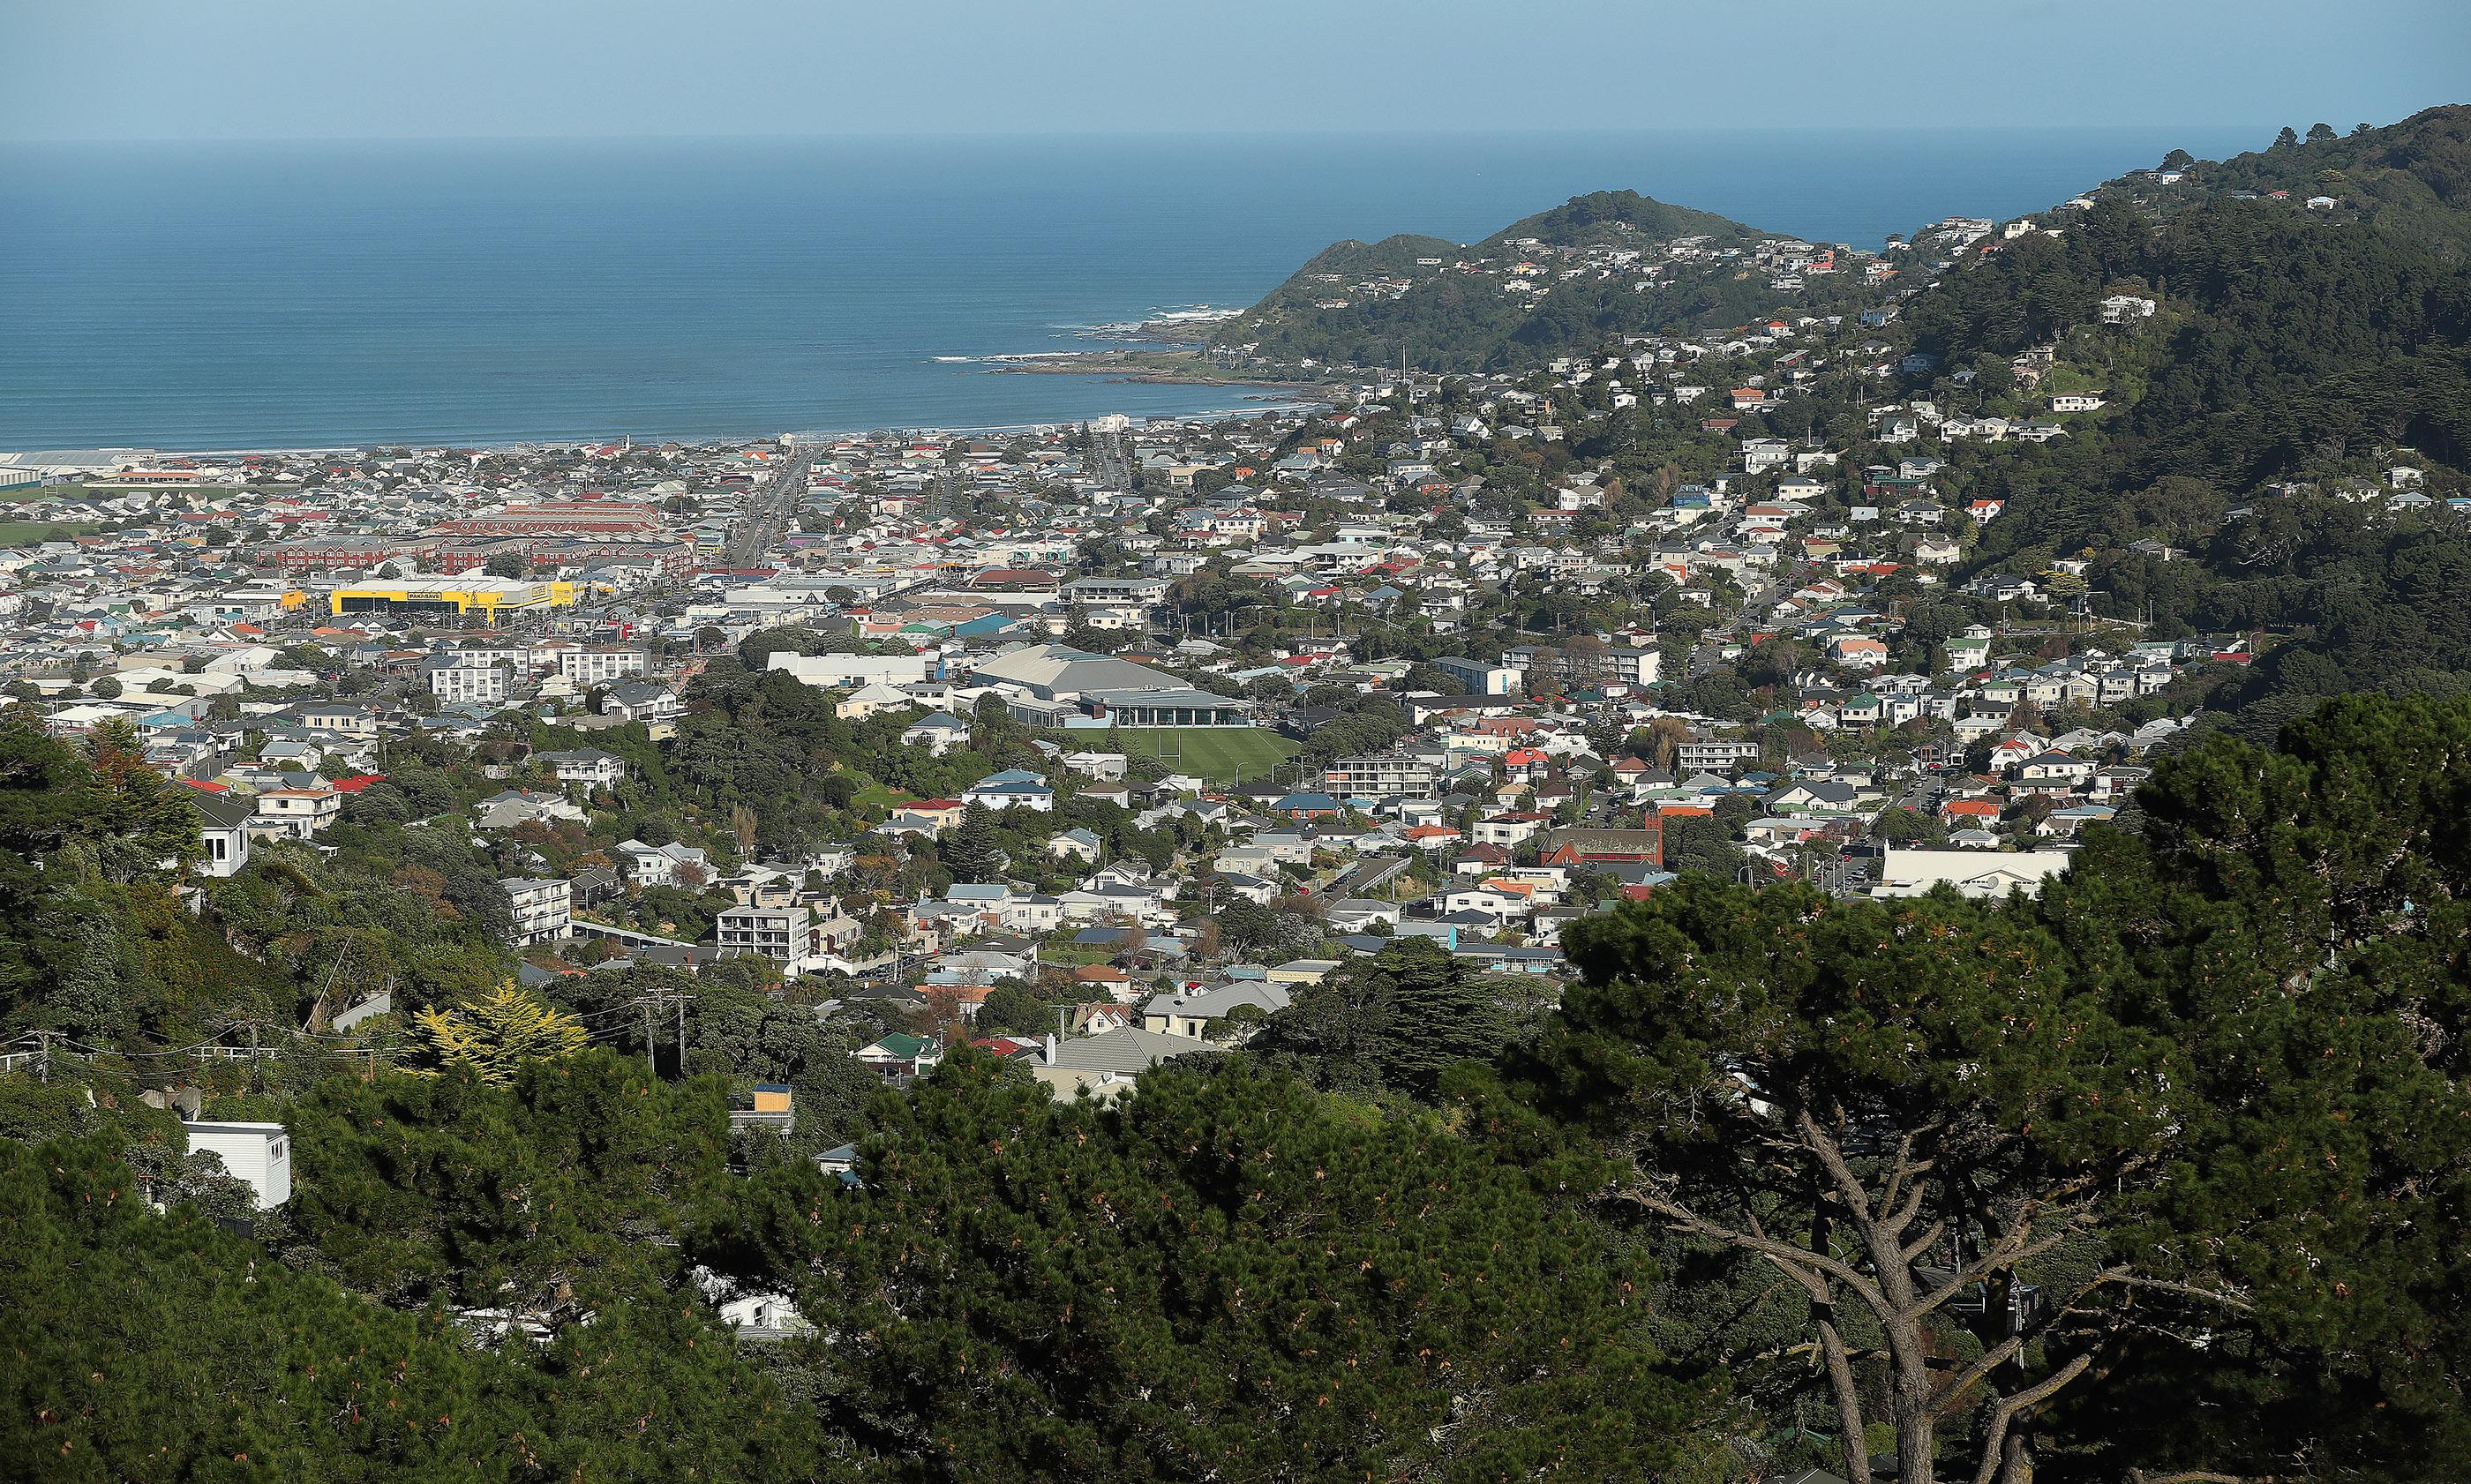 Wellington, New Zealand, on Monday, May 20, 2019.